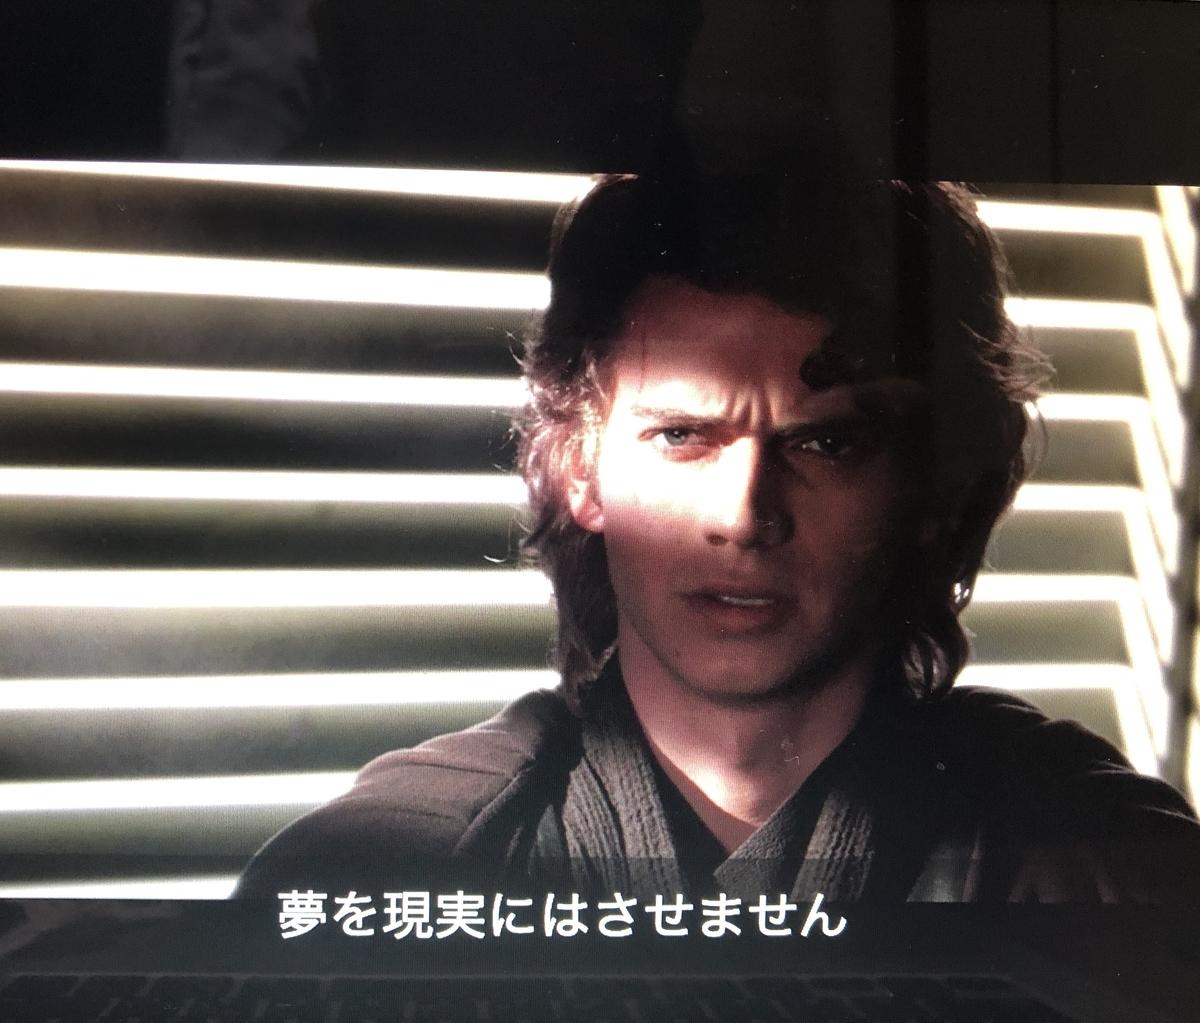 f:id:ShinTamashiro:20191230222455j:plain